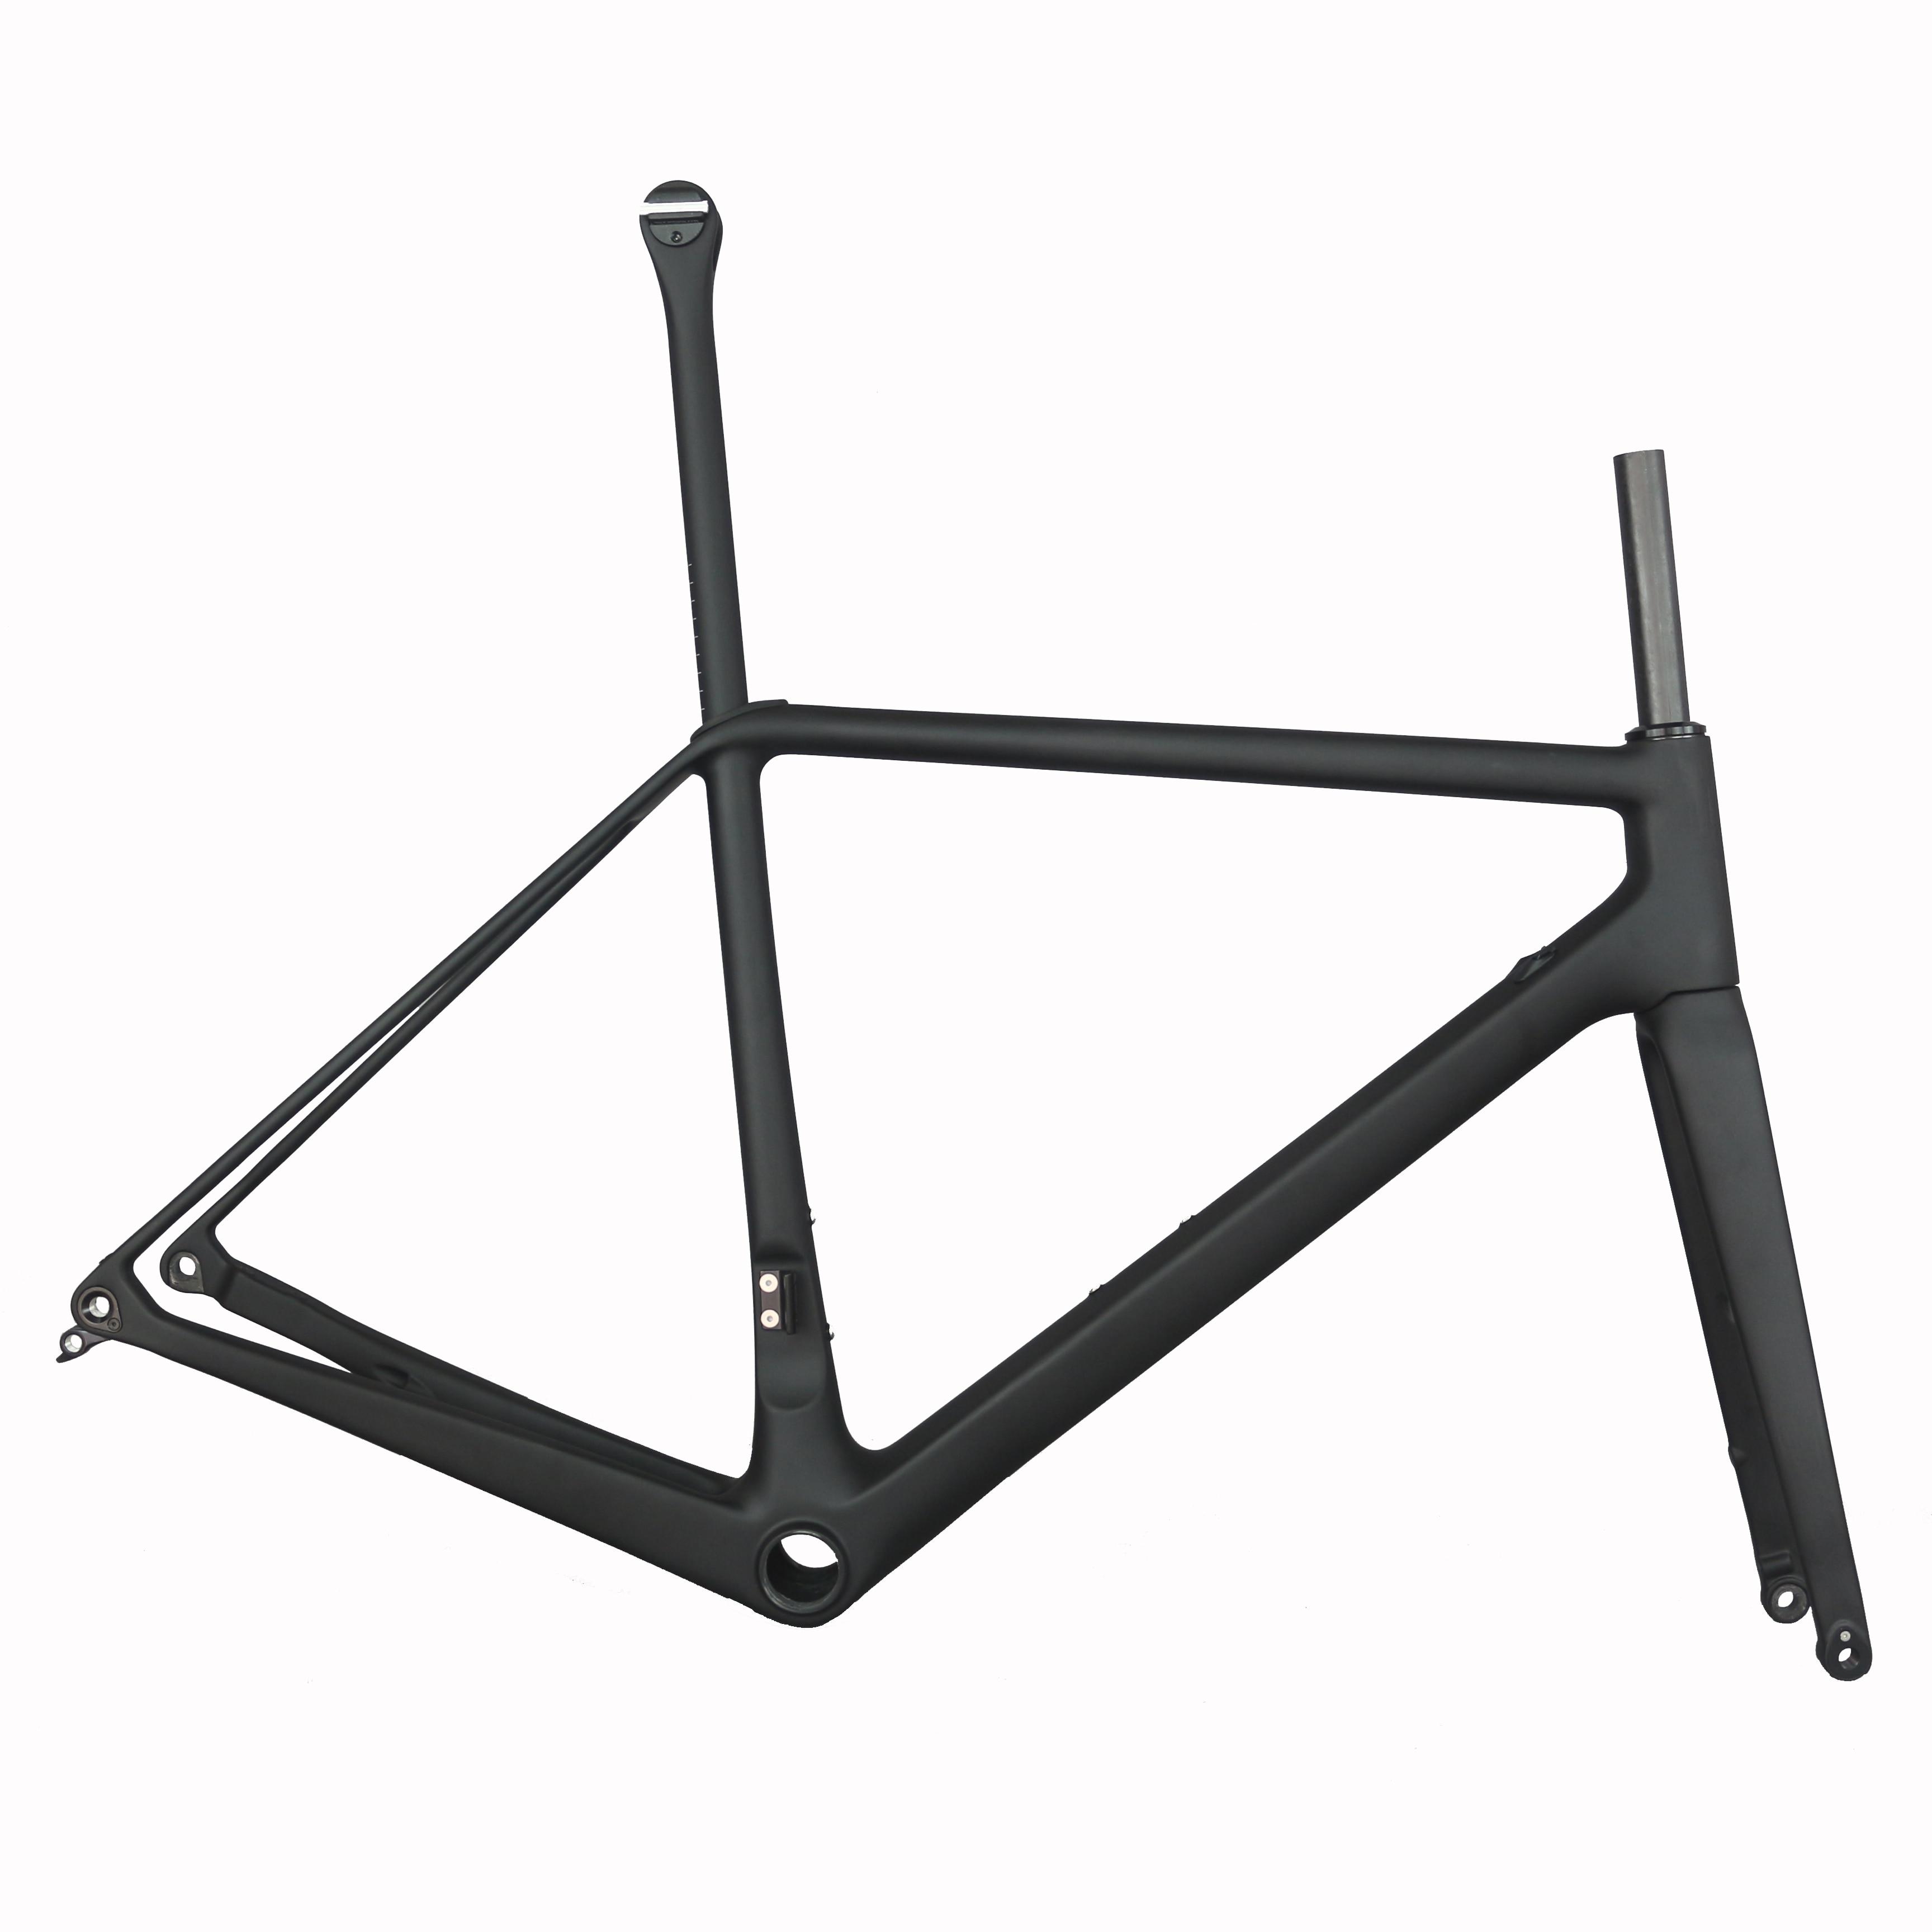 New EPS Technology Flat Mount Disc Brake BB86 Carbon Fiber T1000 Road Bike Frame FM619